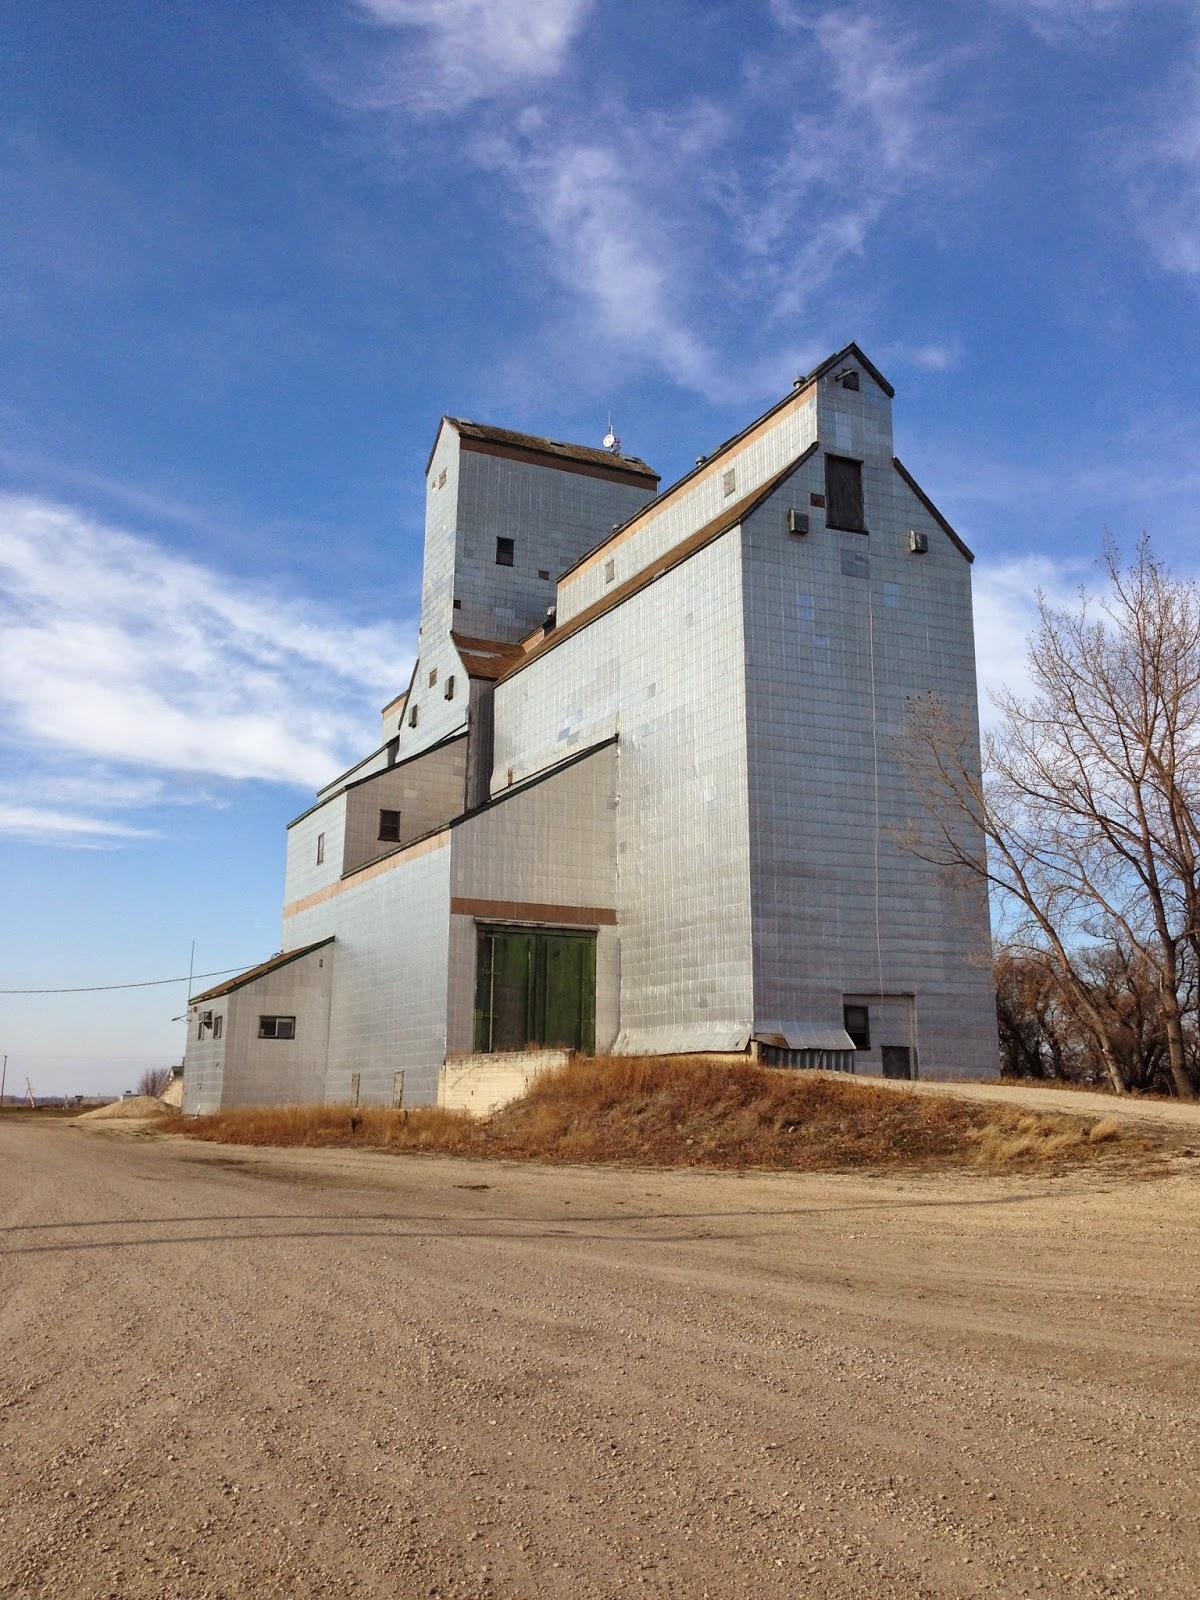 Royal lepage carman grain elevator for sale in manitoba Elevators for sale